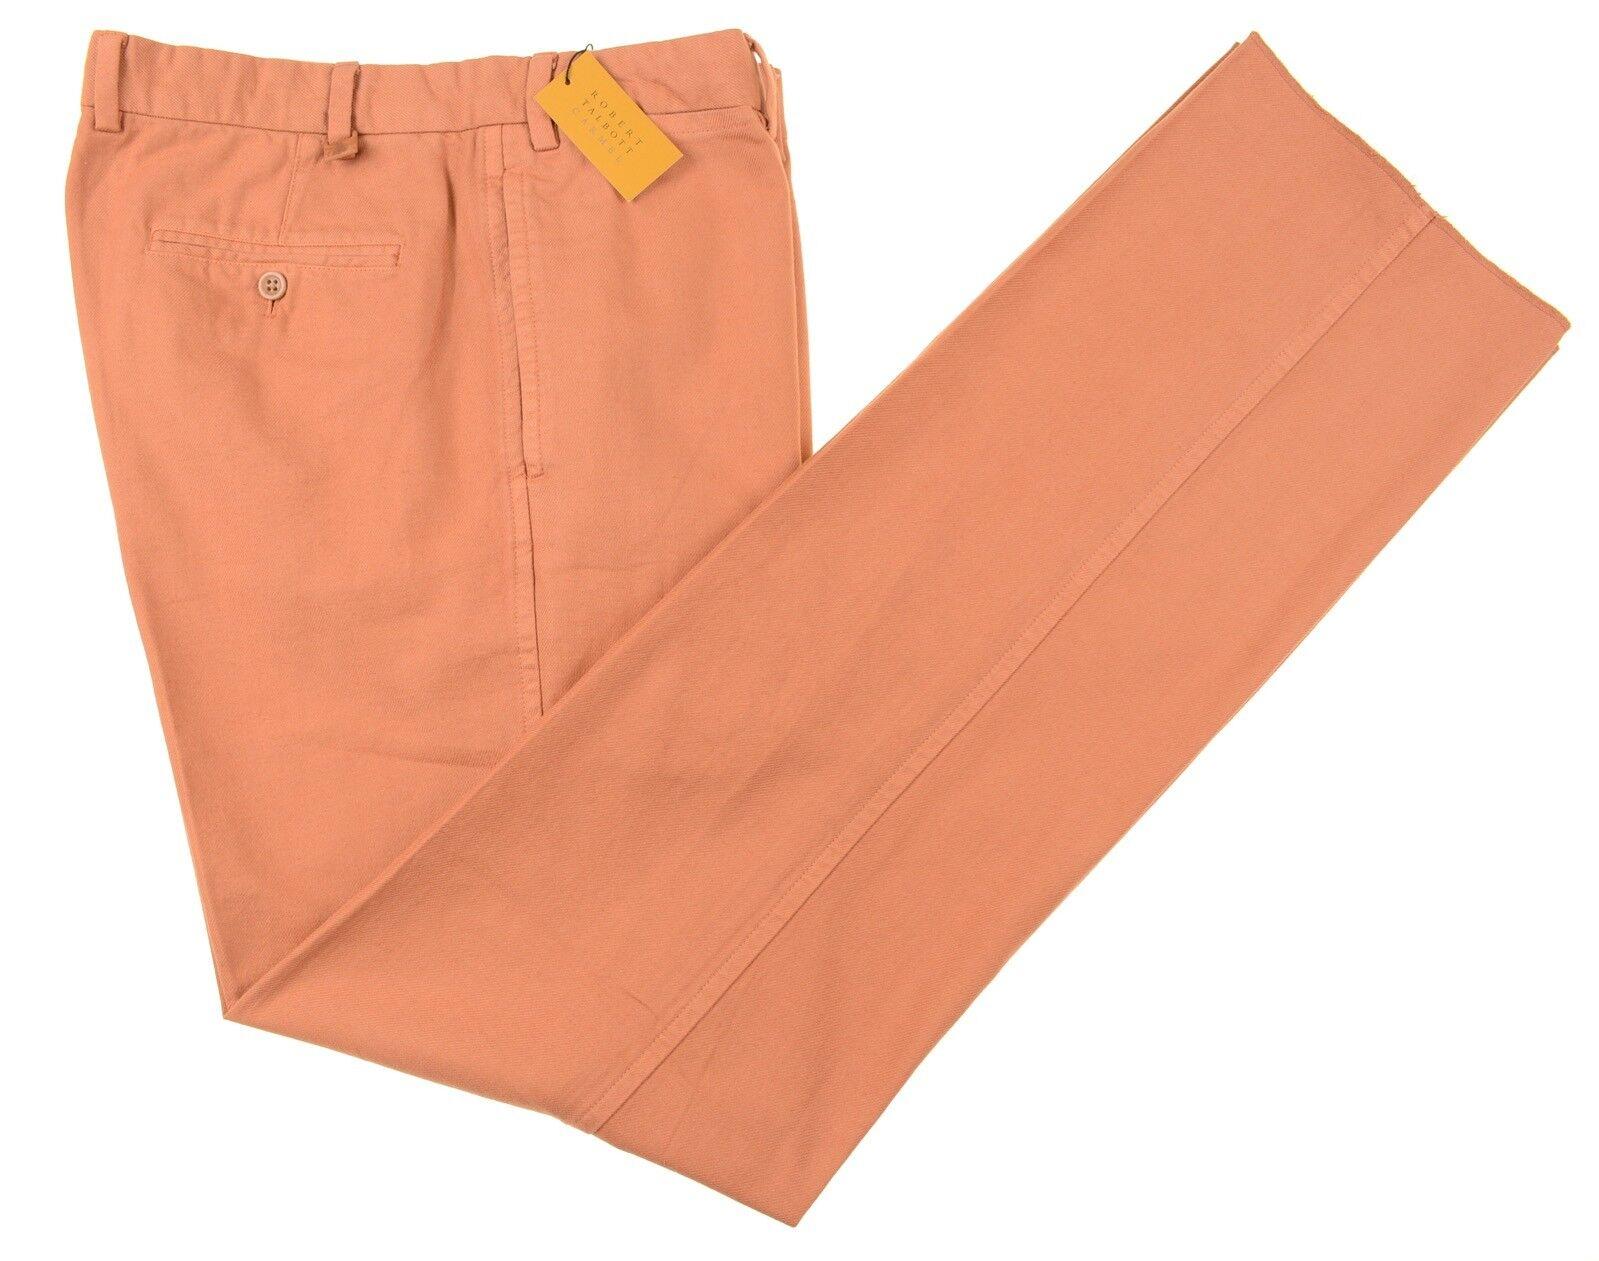 NWT Robert Talbott Carmel Burnt orange Brushed Twill Cotton Casual Pants 36 NEW